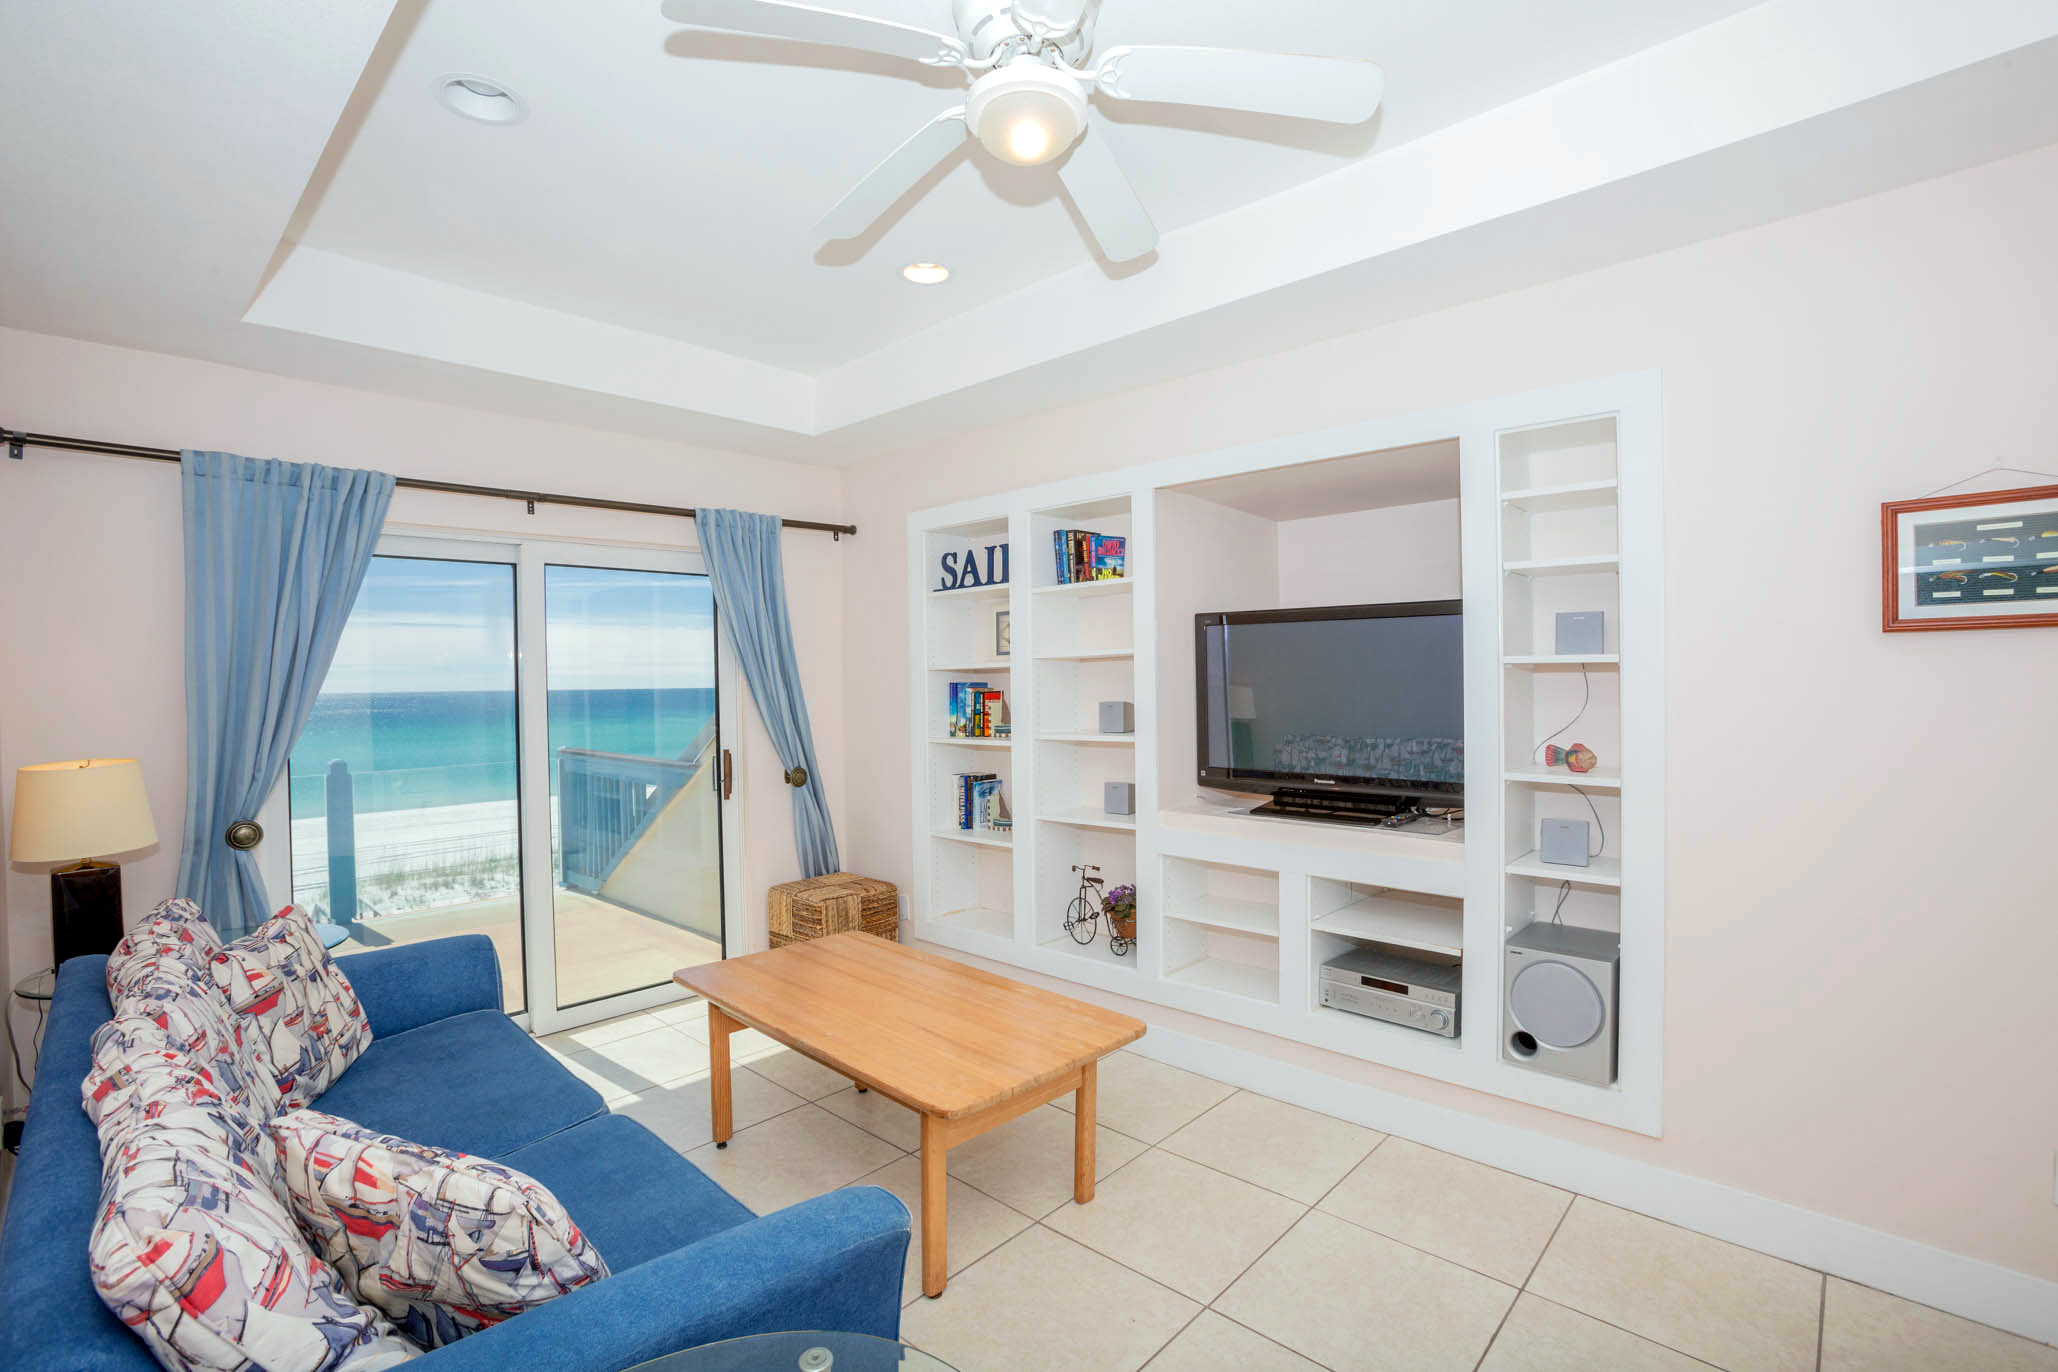 Ariola 1214 House/Cottage rental in Luxury Homes in Pensacola Beach Florida - #30